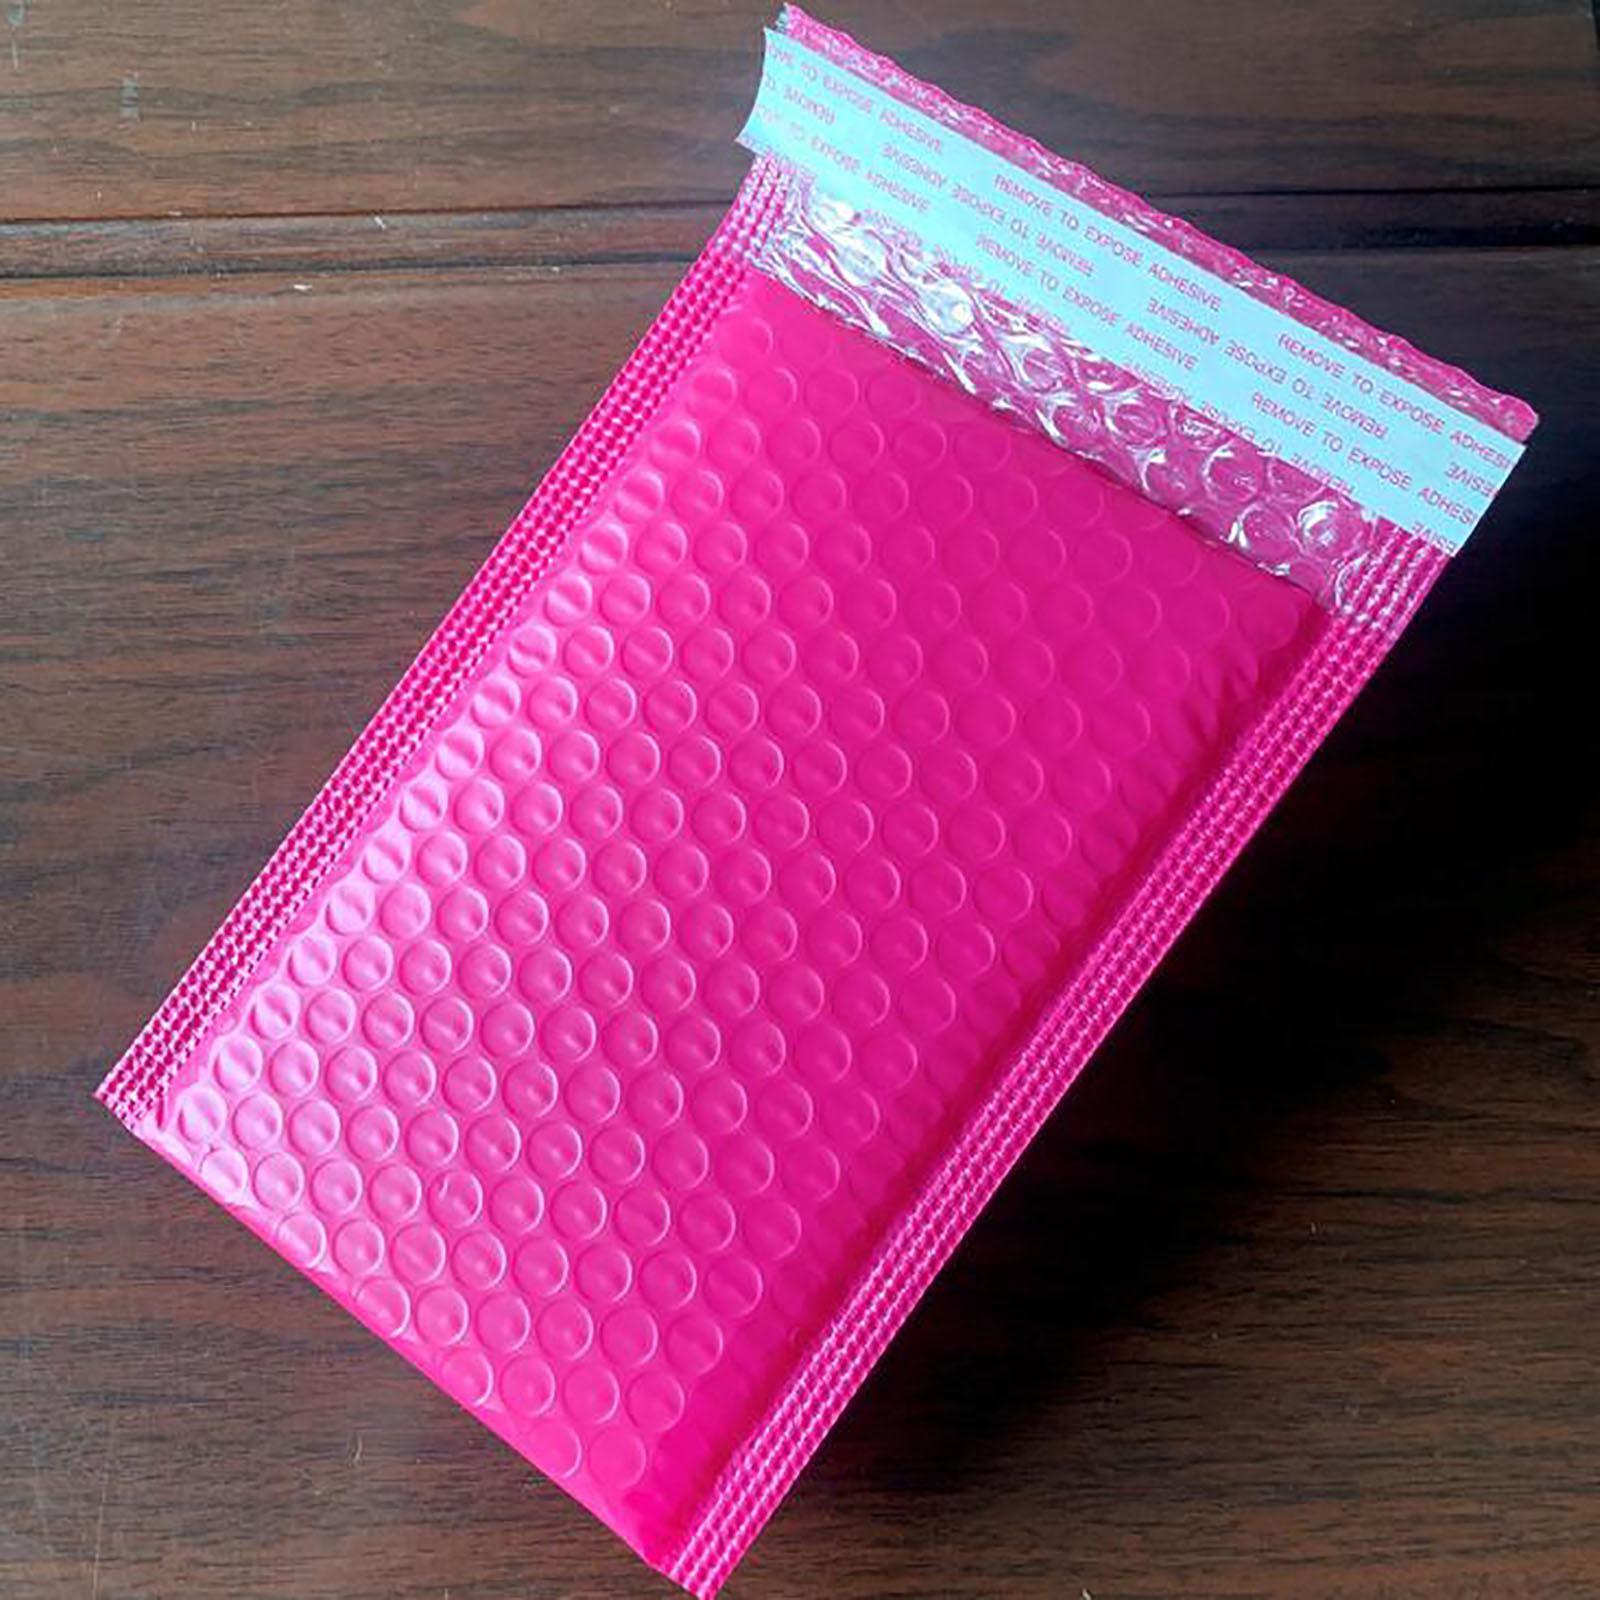 100 pcs bolha mailers acolchoado envelopes pérola película presente presente correio saco de envelope para livro revista alinhado mailer auto selo rosa h jllmps